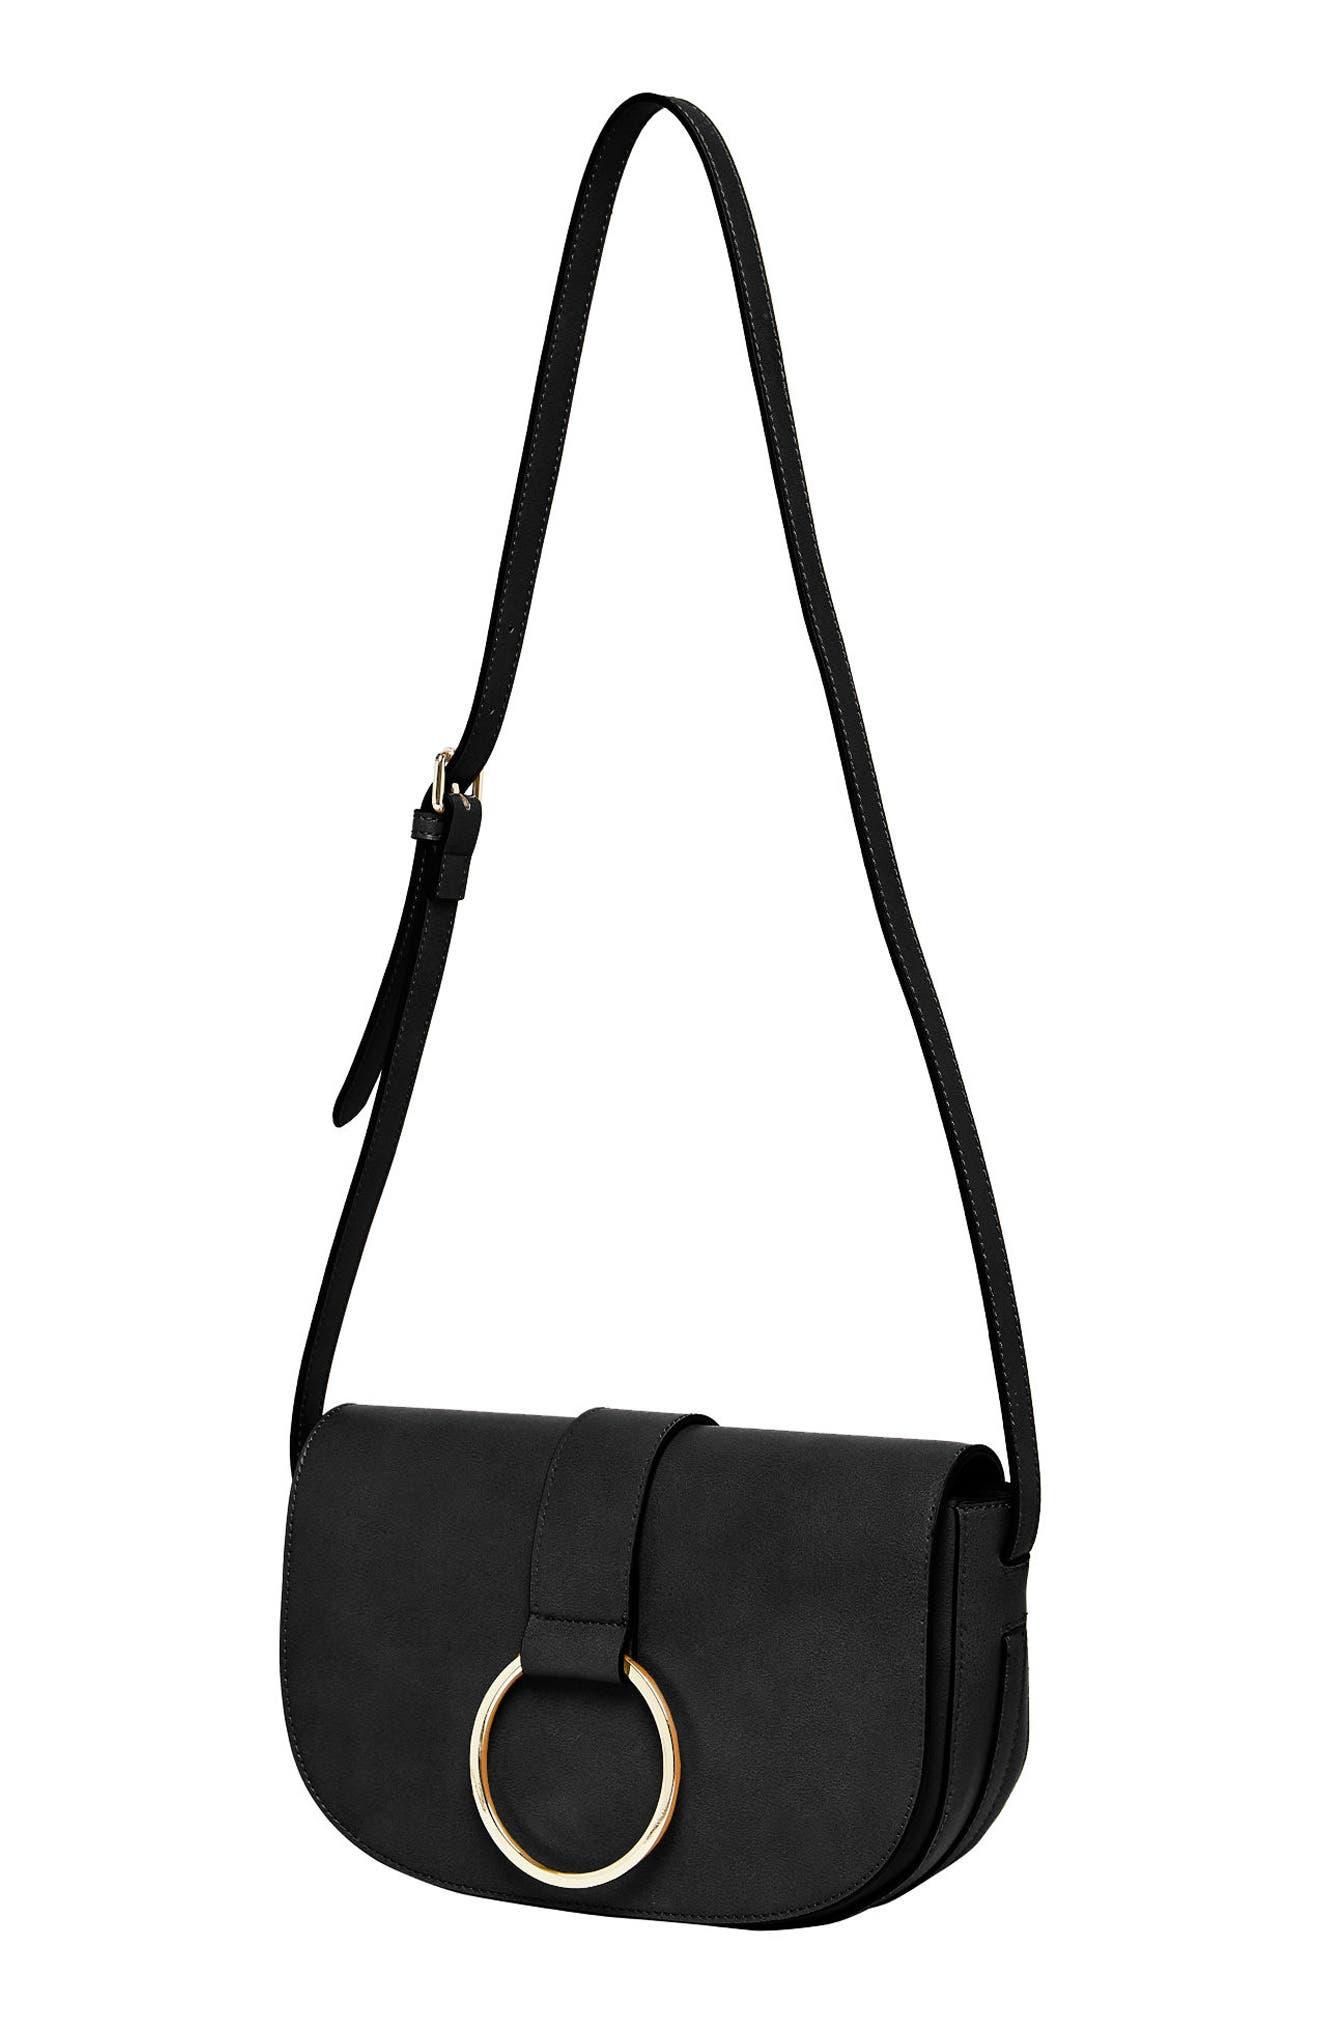 Lola Vegan Leather Crossbody Saddle Bag,                             Alternate thumbnail 3, color,                             001